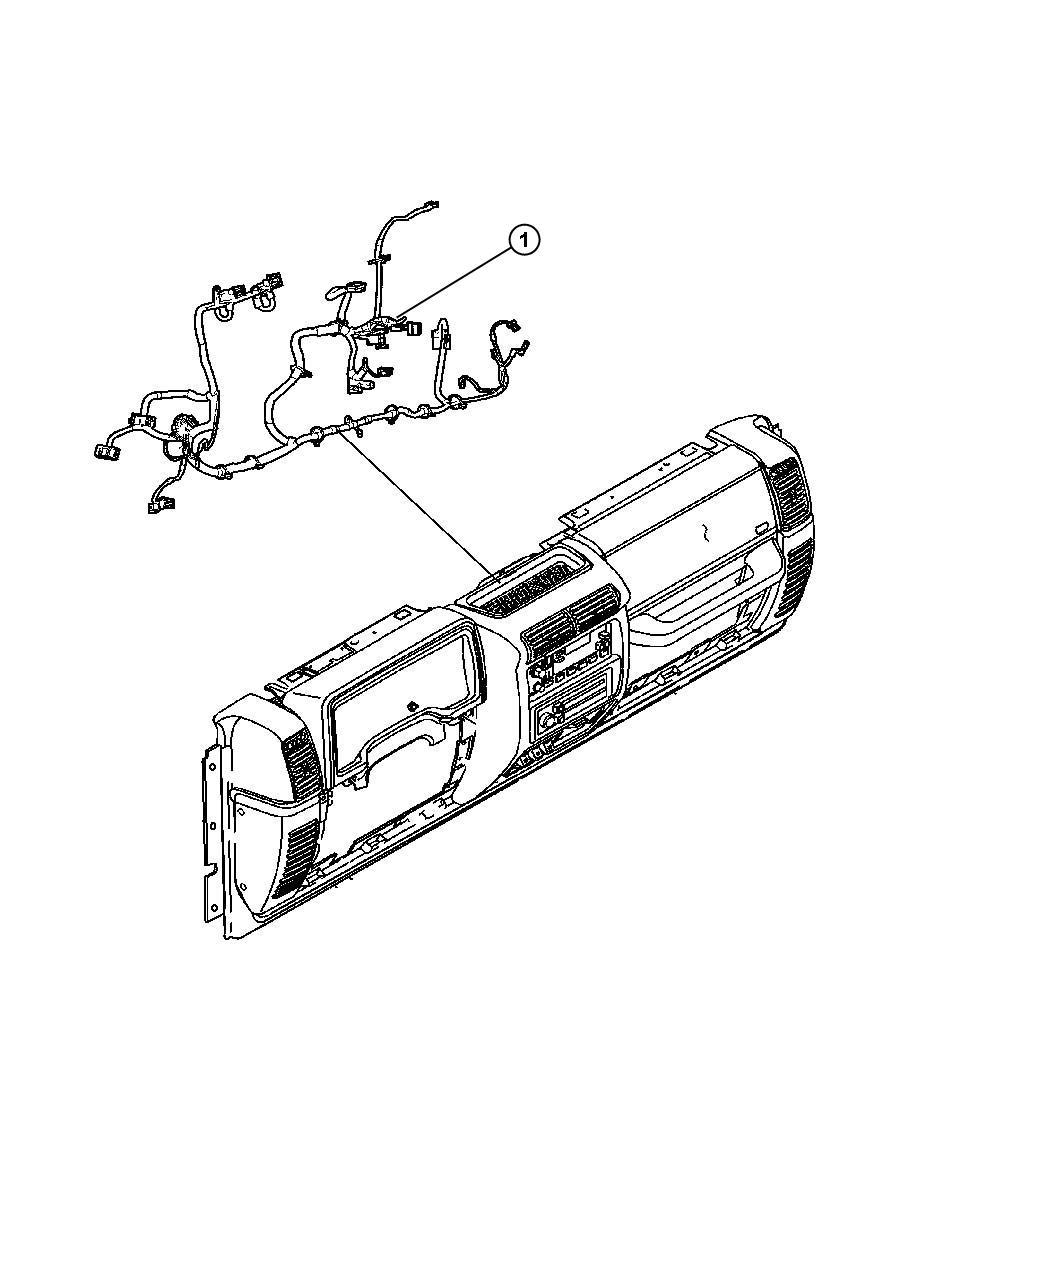 Jeep Wrangler Wiring Instrument Panel Pwr Windows